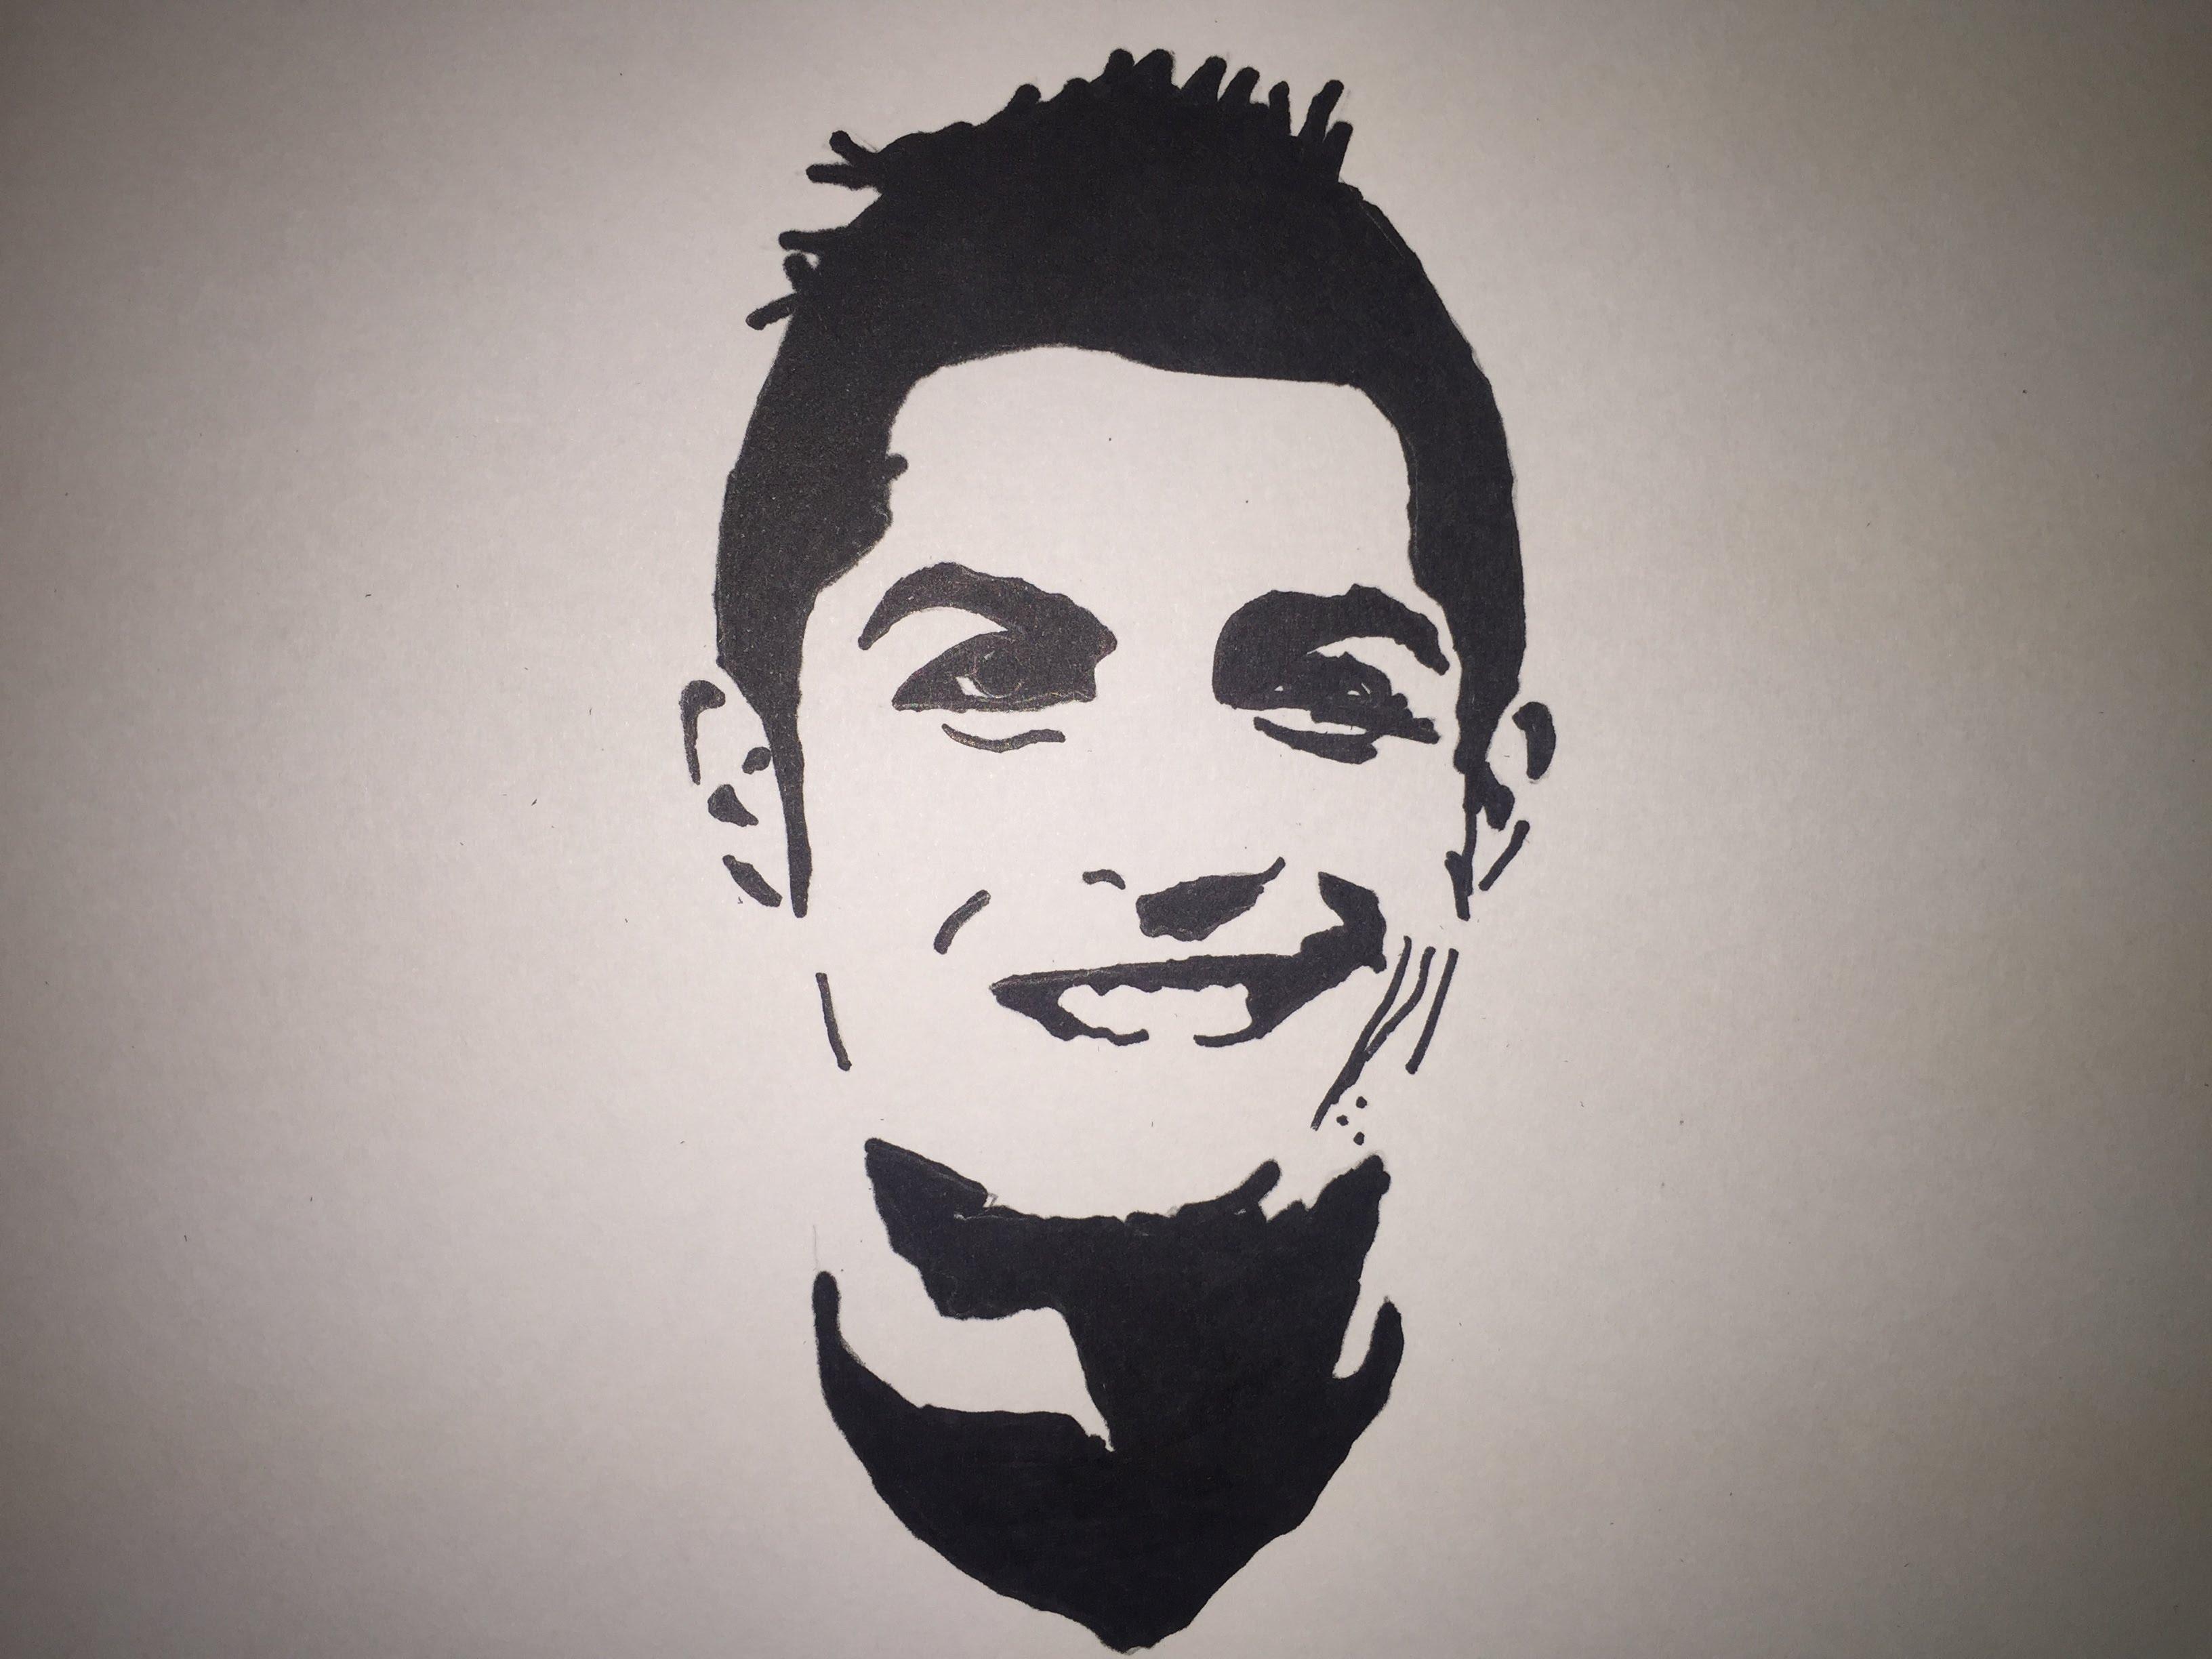 3264x2448 Drawing Cristiano Ronaldo